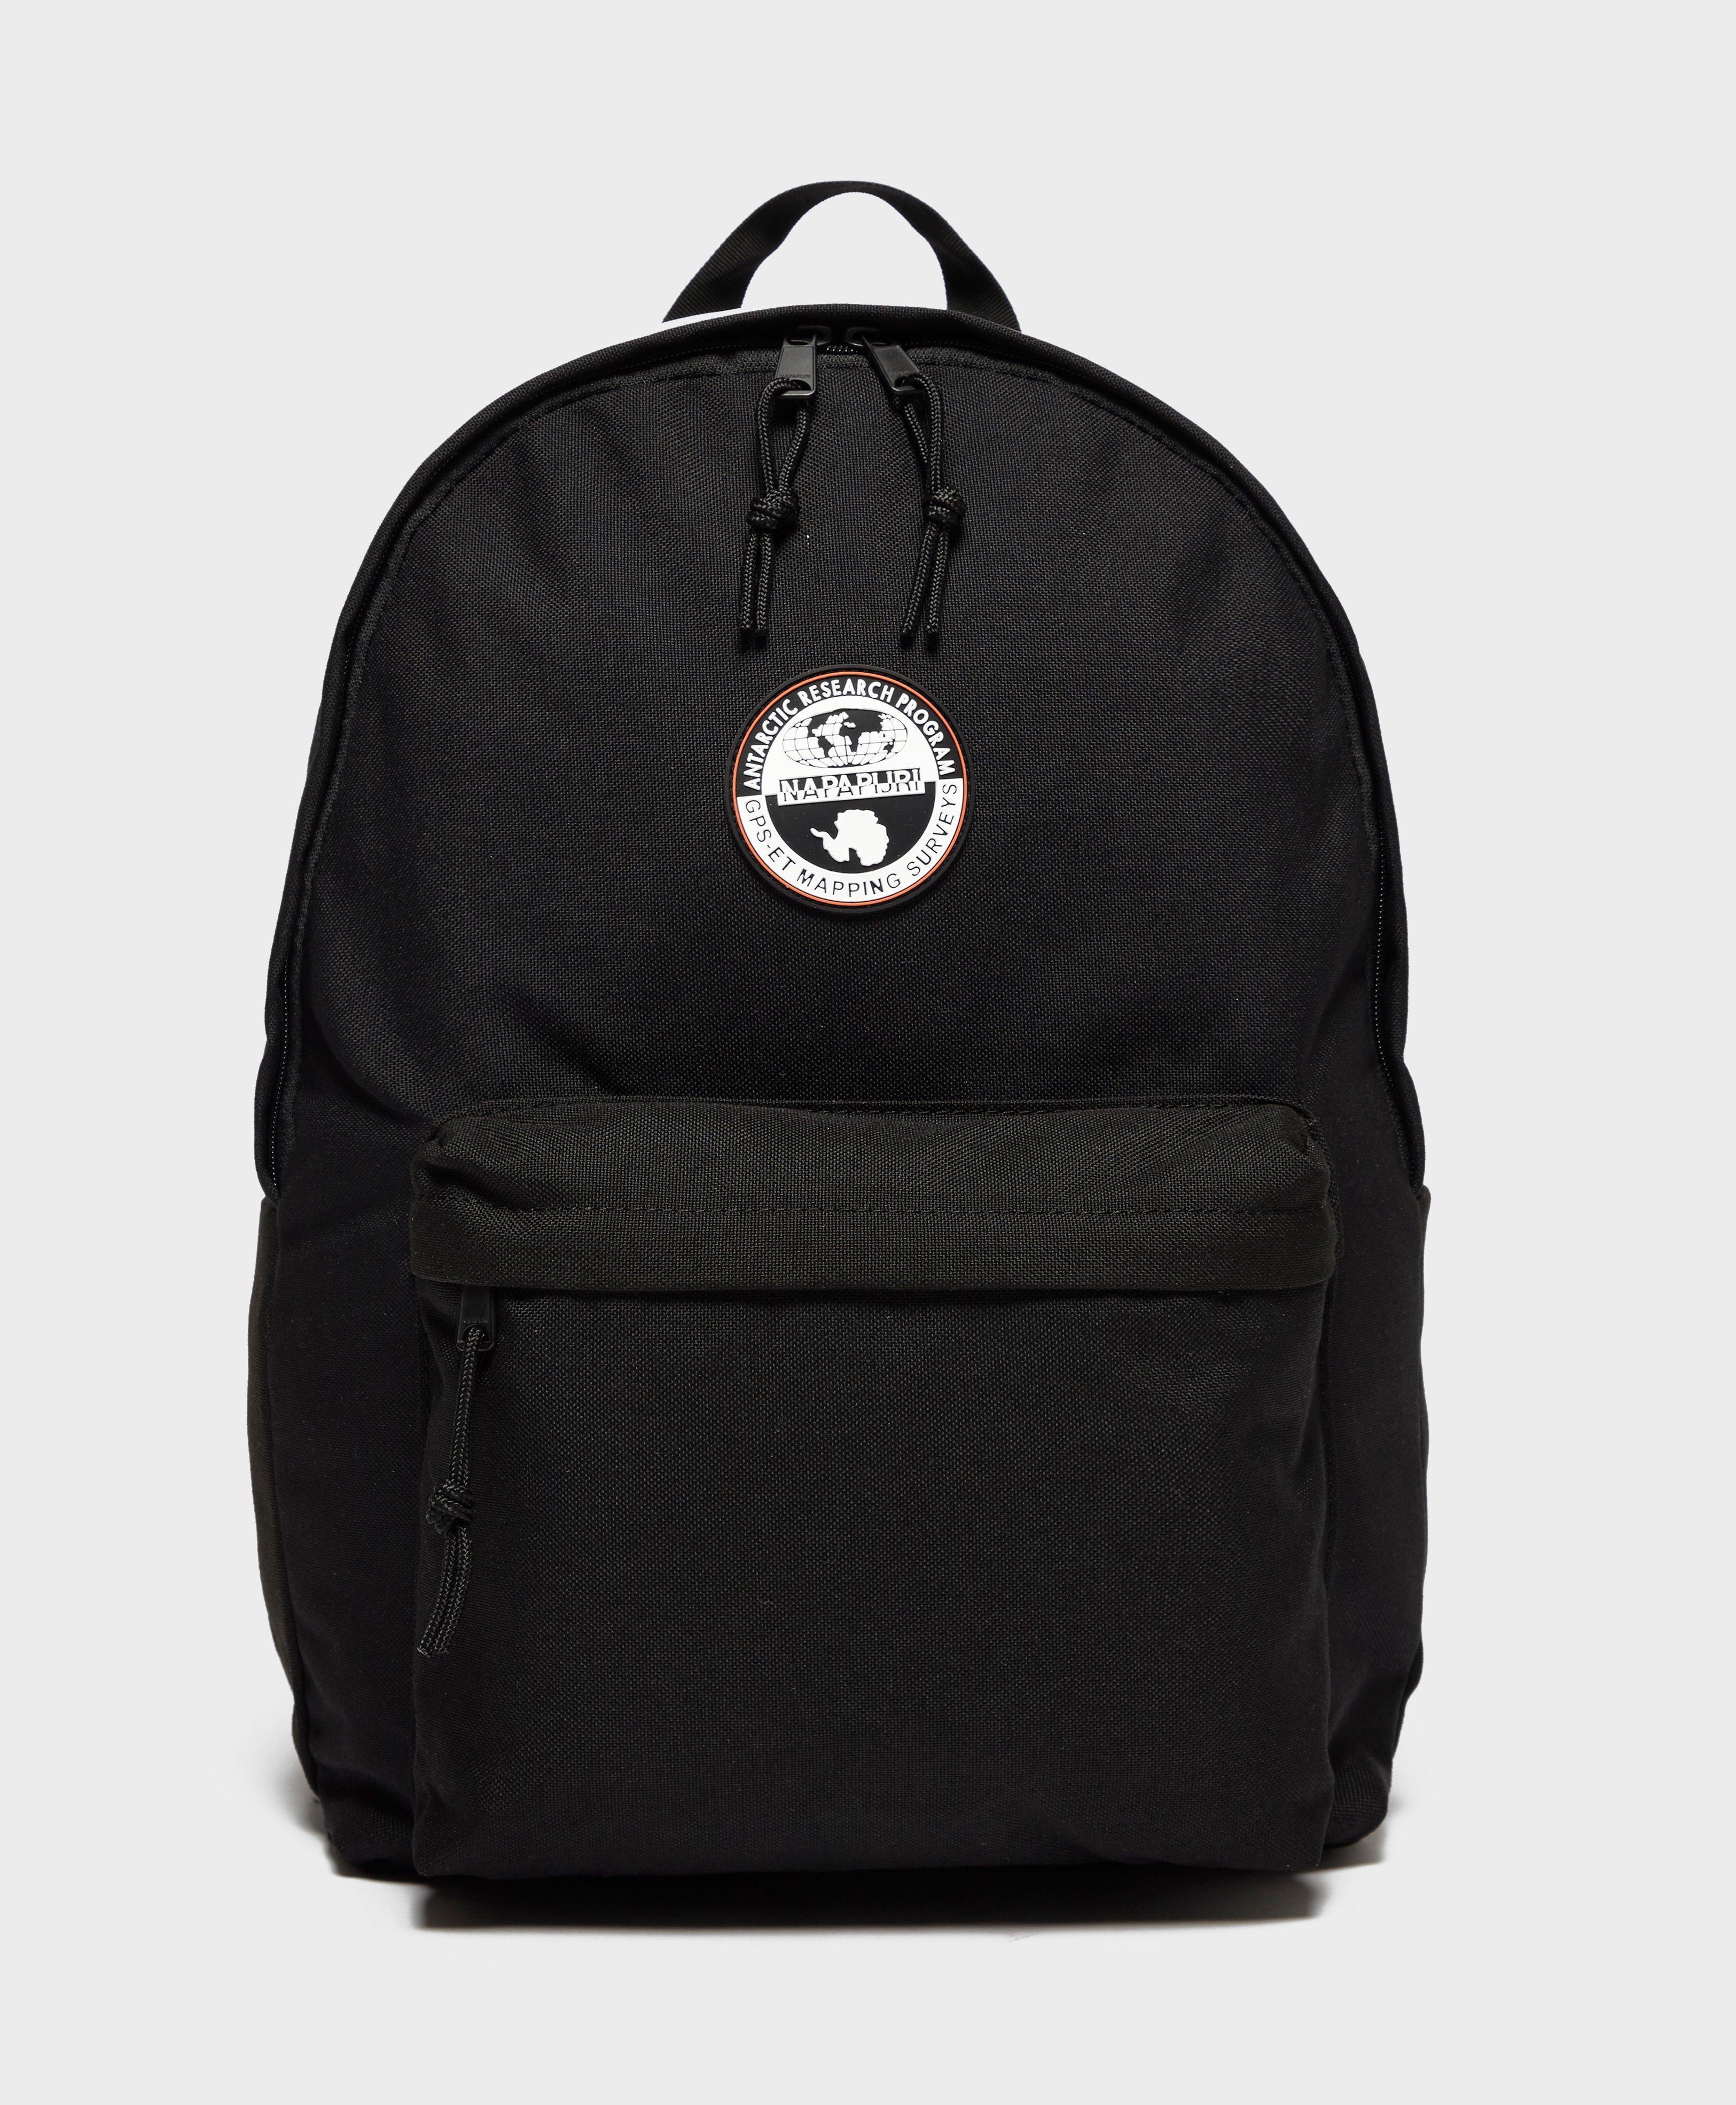 ... Napapijri - Black Happy Day Backpack for Men - Lyst. View fullscreen  online store bf805 ... 2b8208d261